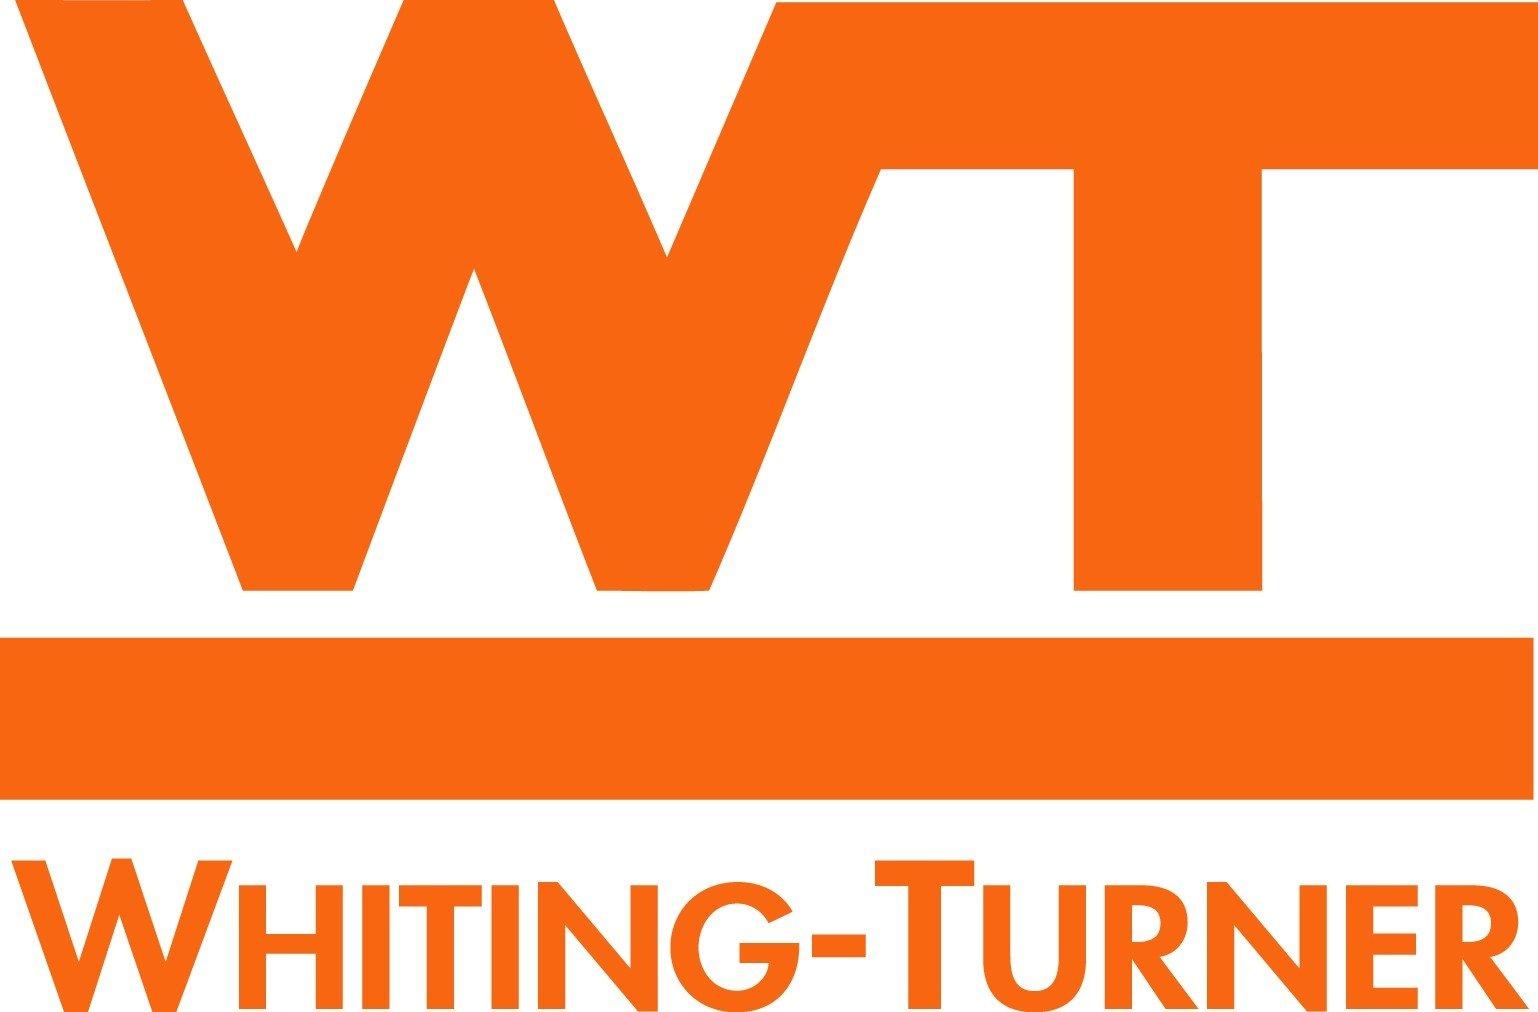 Whiting Turner